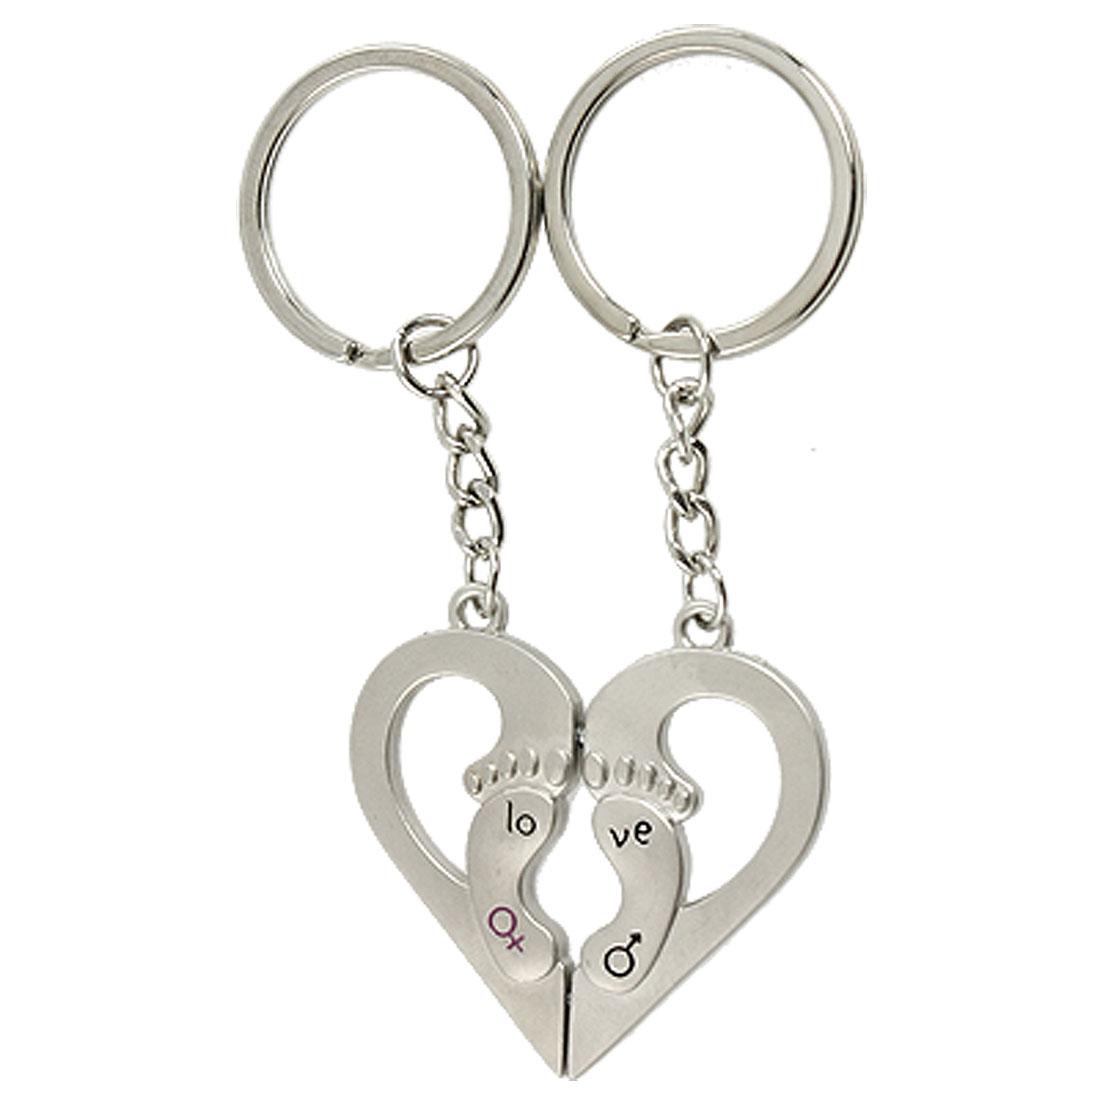 Lovers Gender Symbol Magnetic Heart Pendant Keychain Keyring